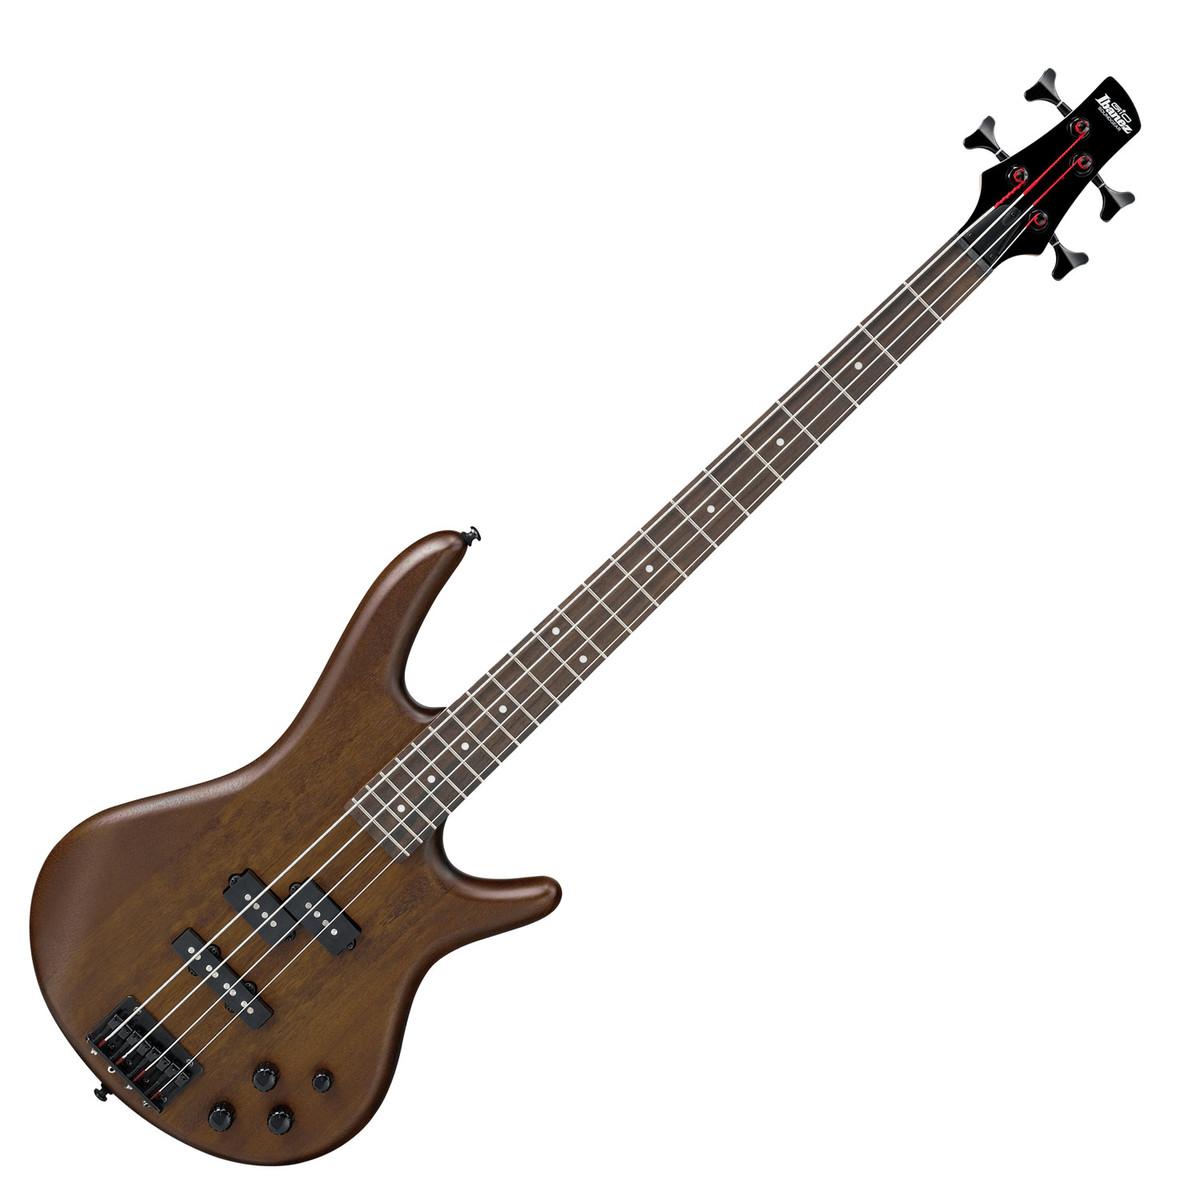 Ibanez Gsr200b Gio Bass Guitar Walnut Fade At Gear4music